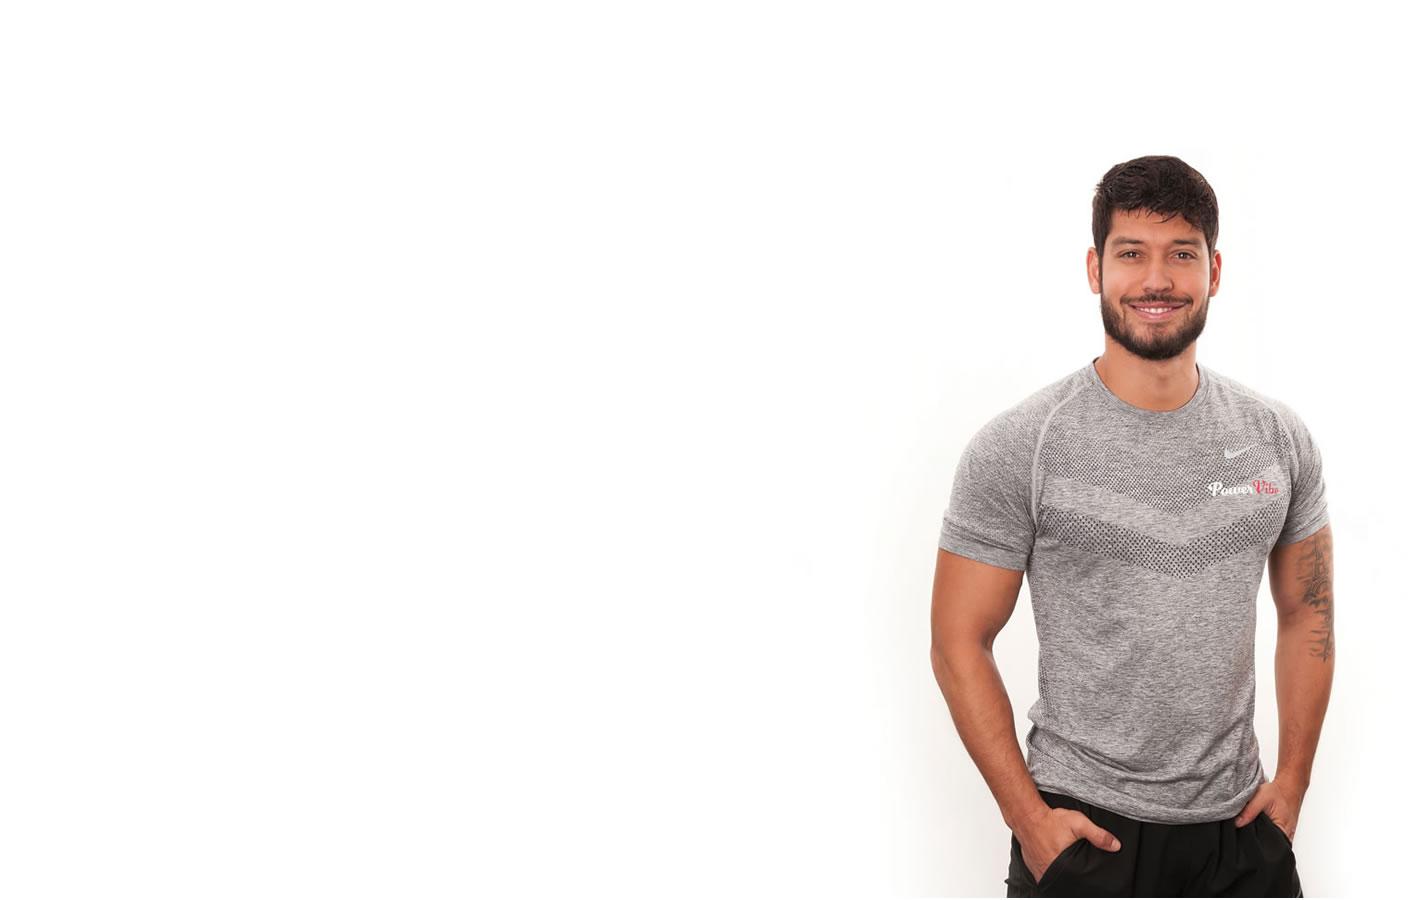 Powervibe personal trainer Maykon Alvarenga